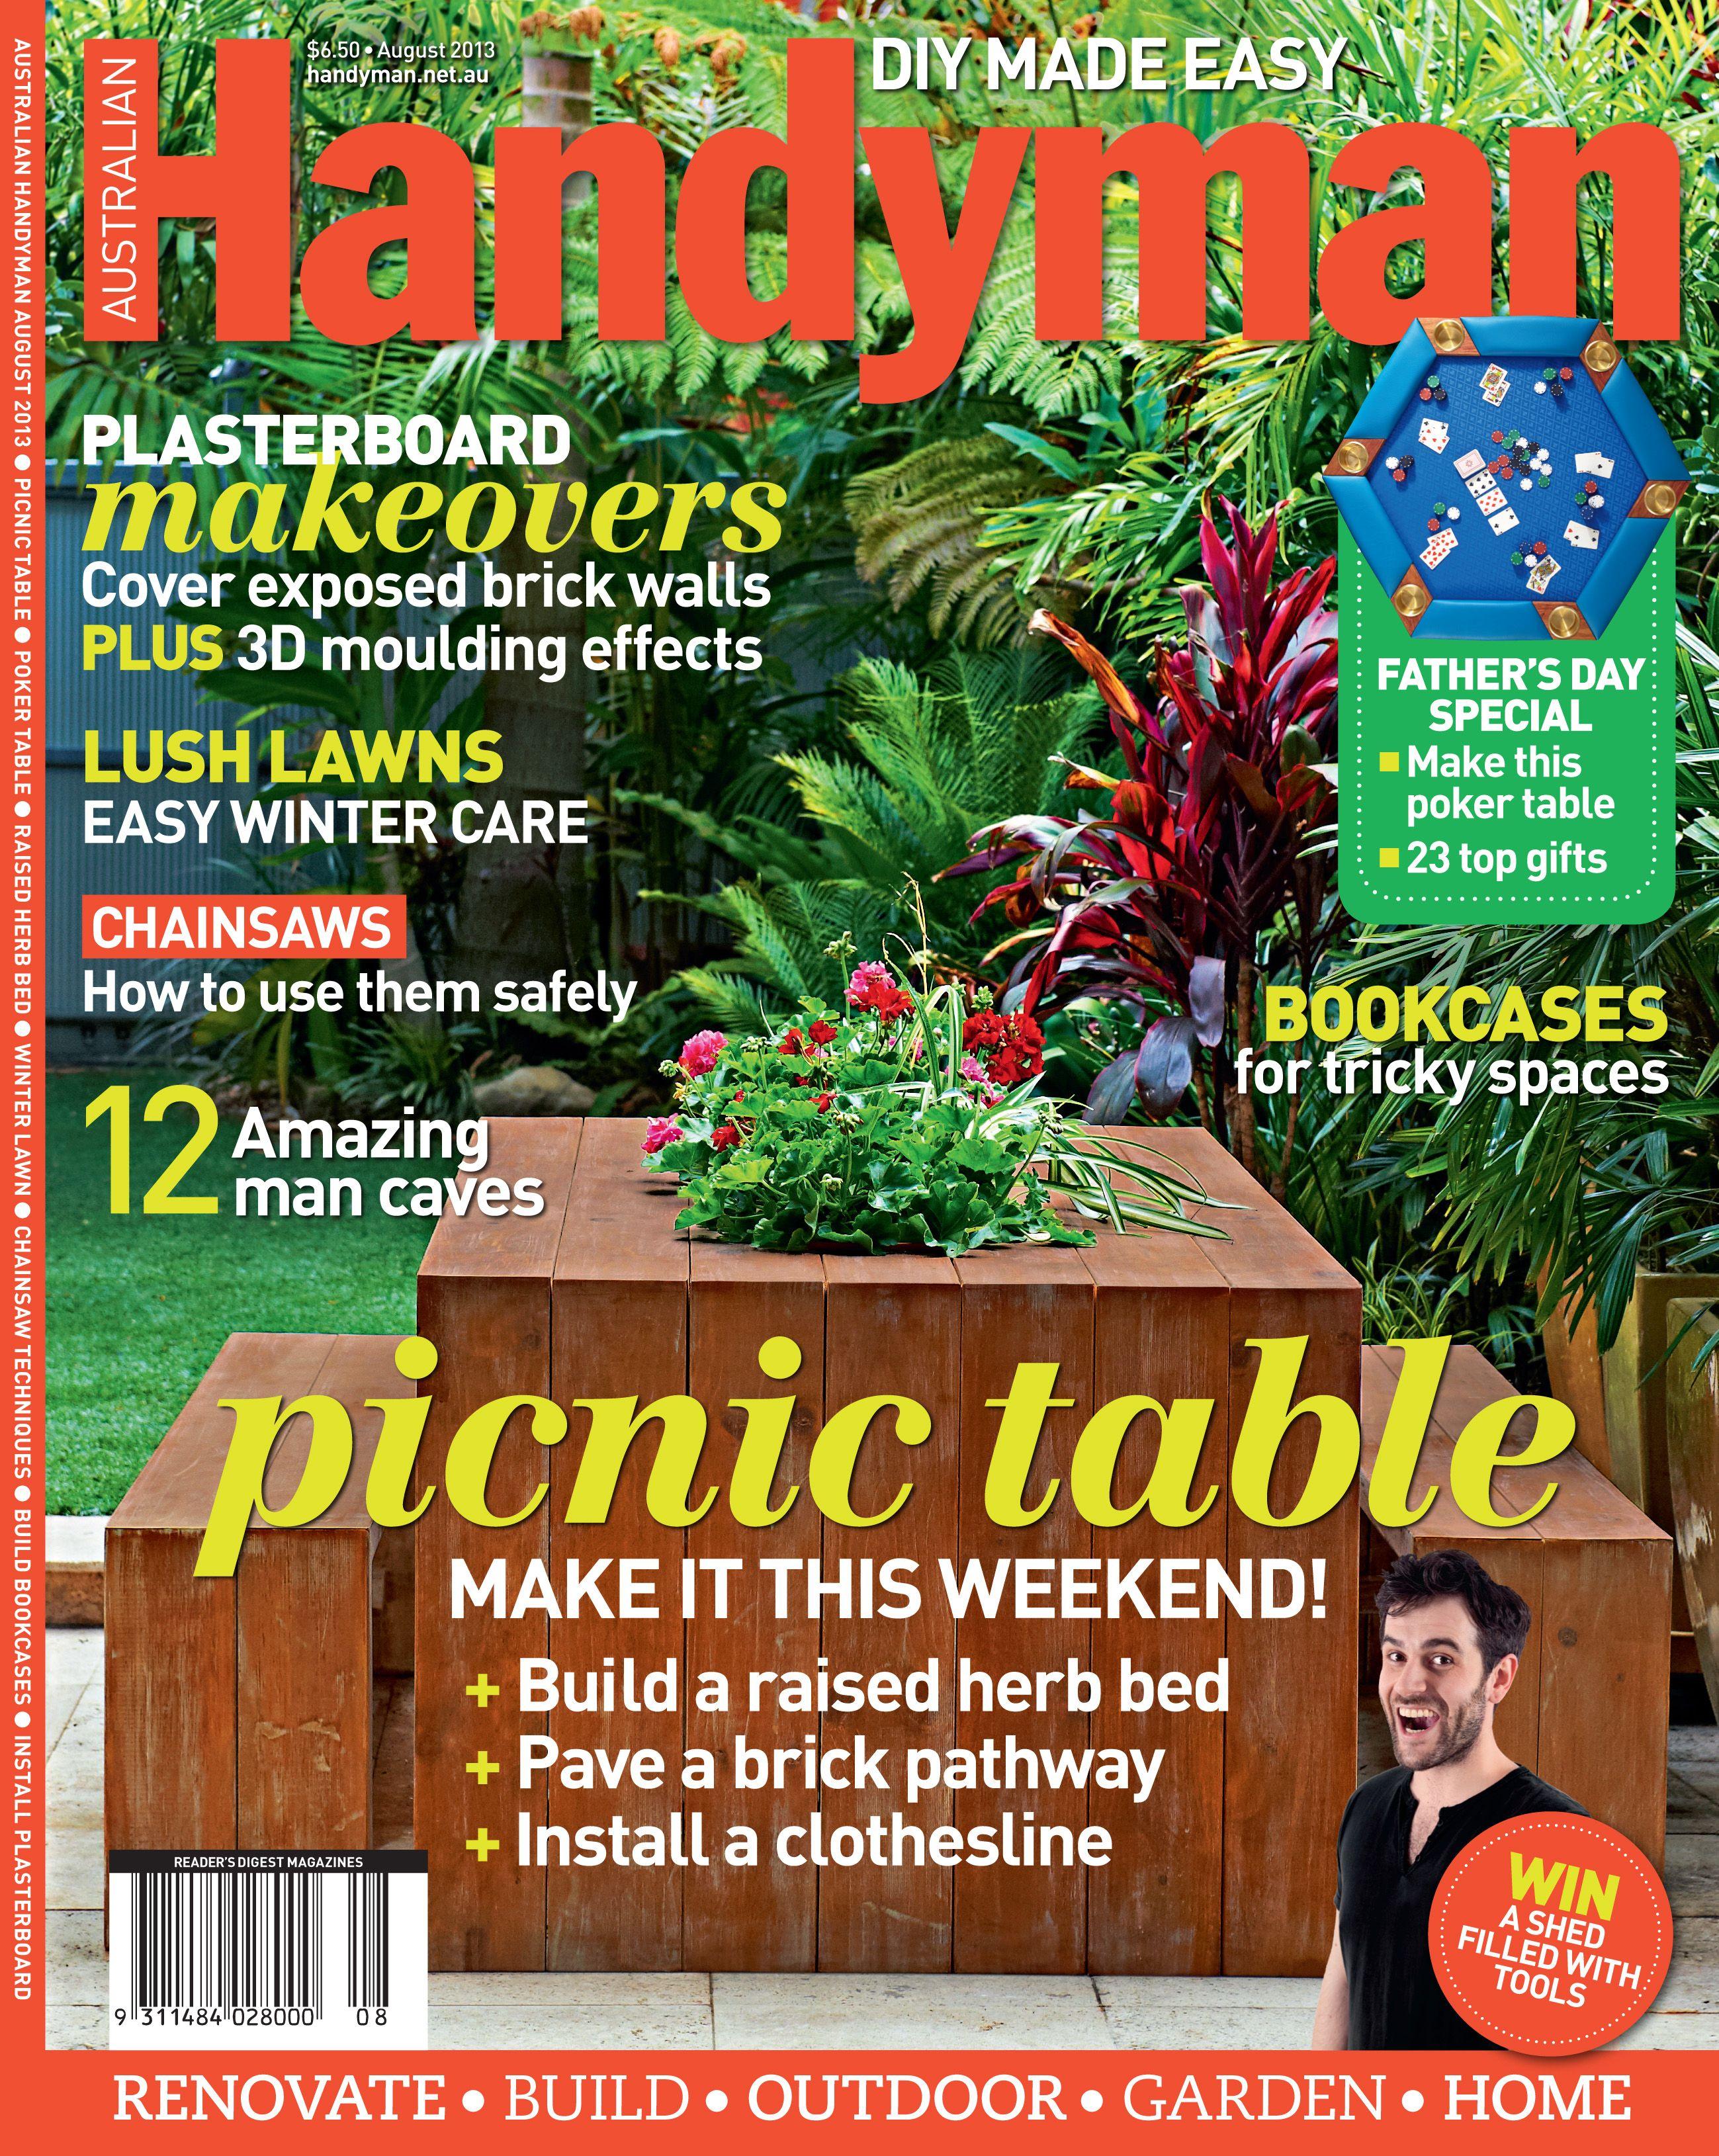 Australian handyman magazine august 2013 with images